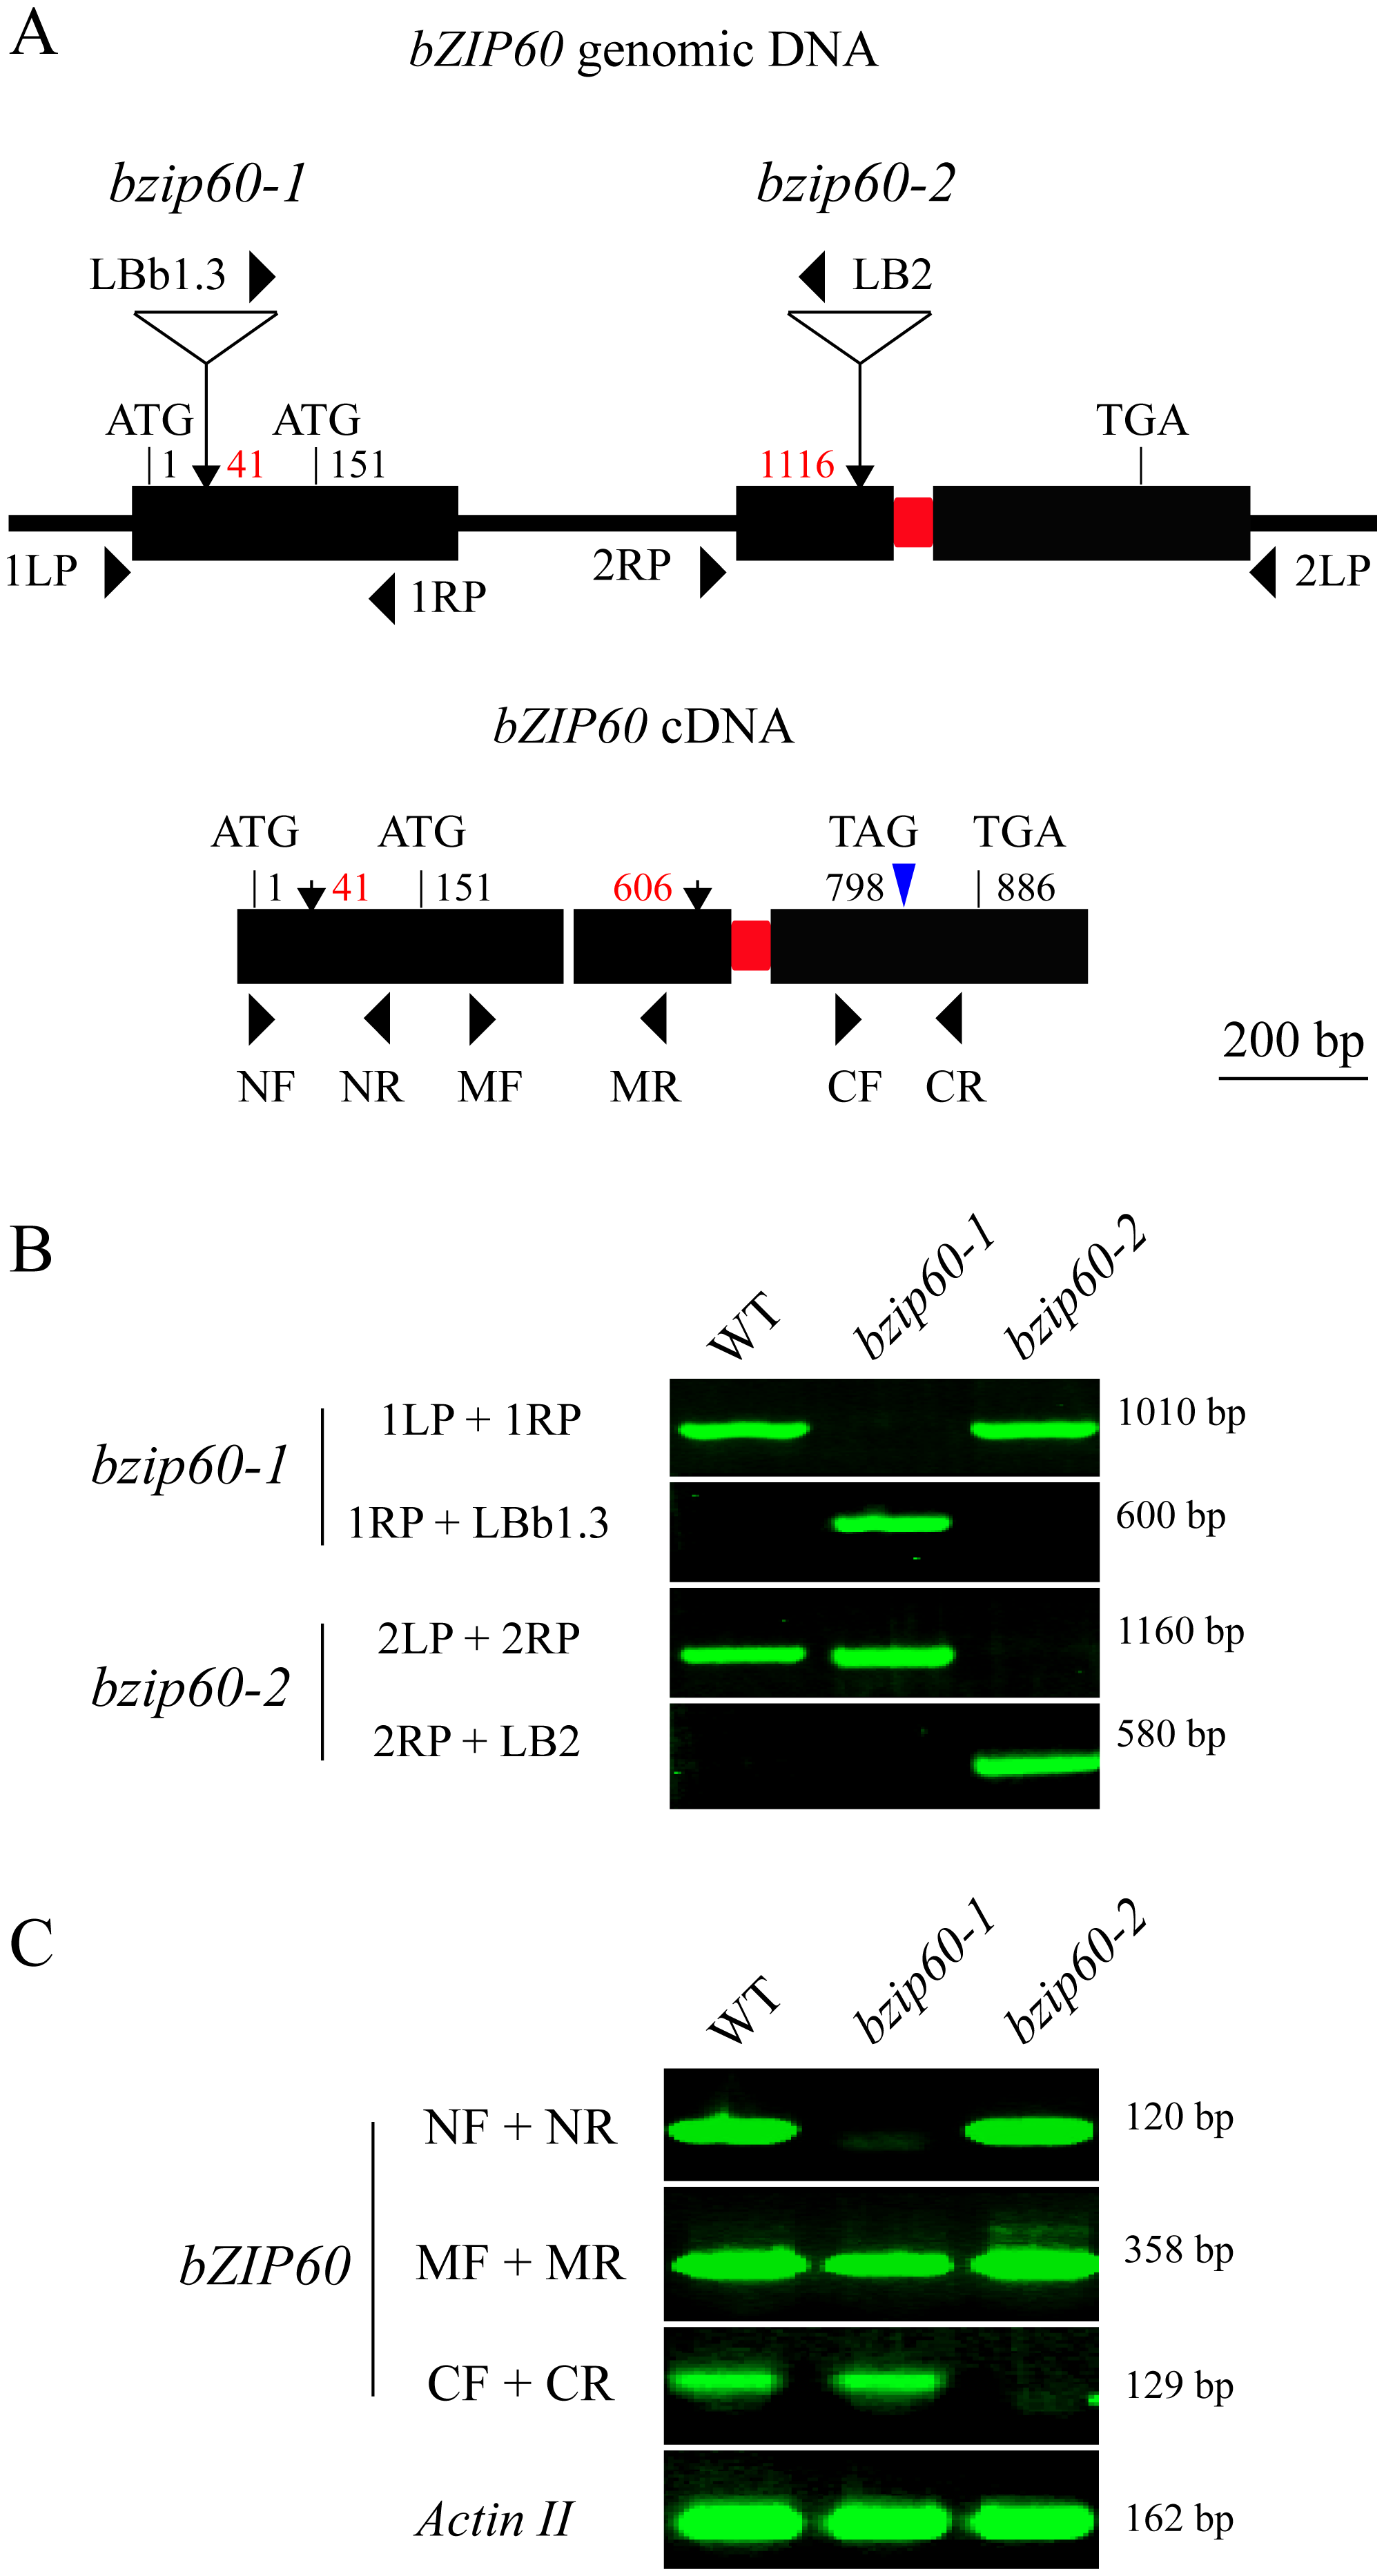 Molecular characterization of the <i>bzip60</i> mutants.